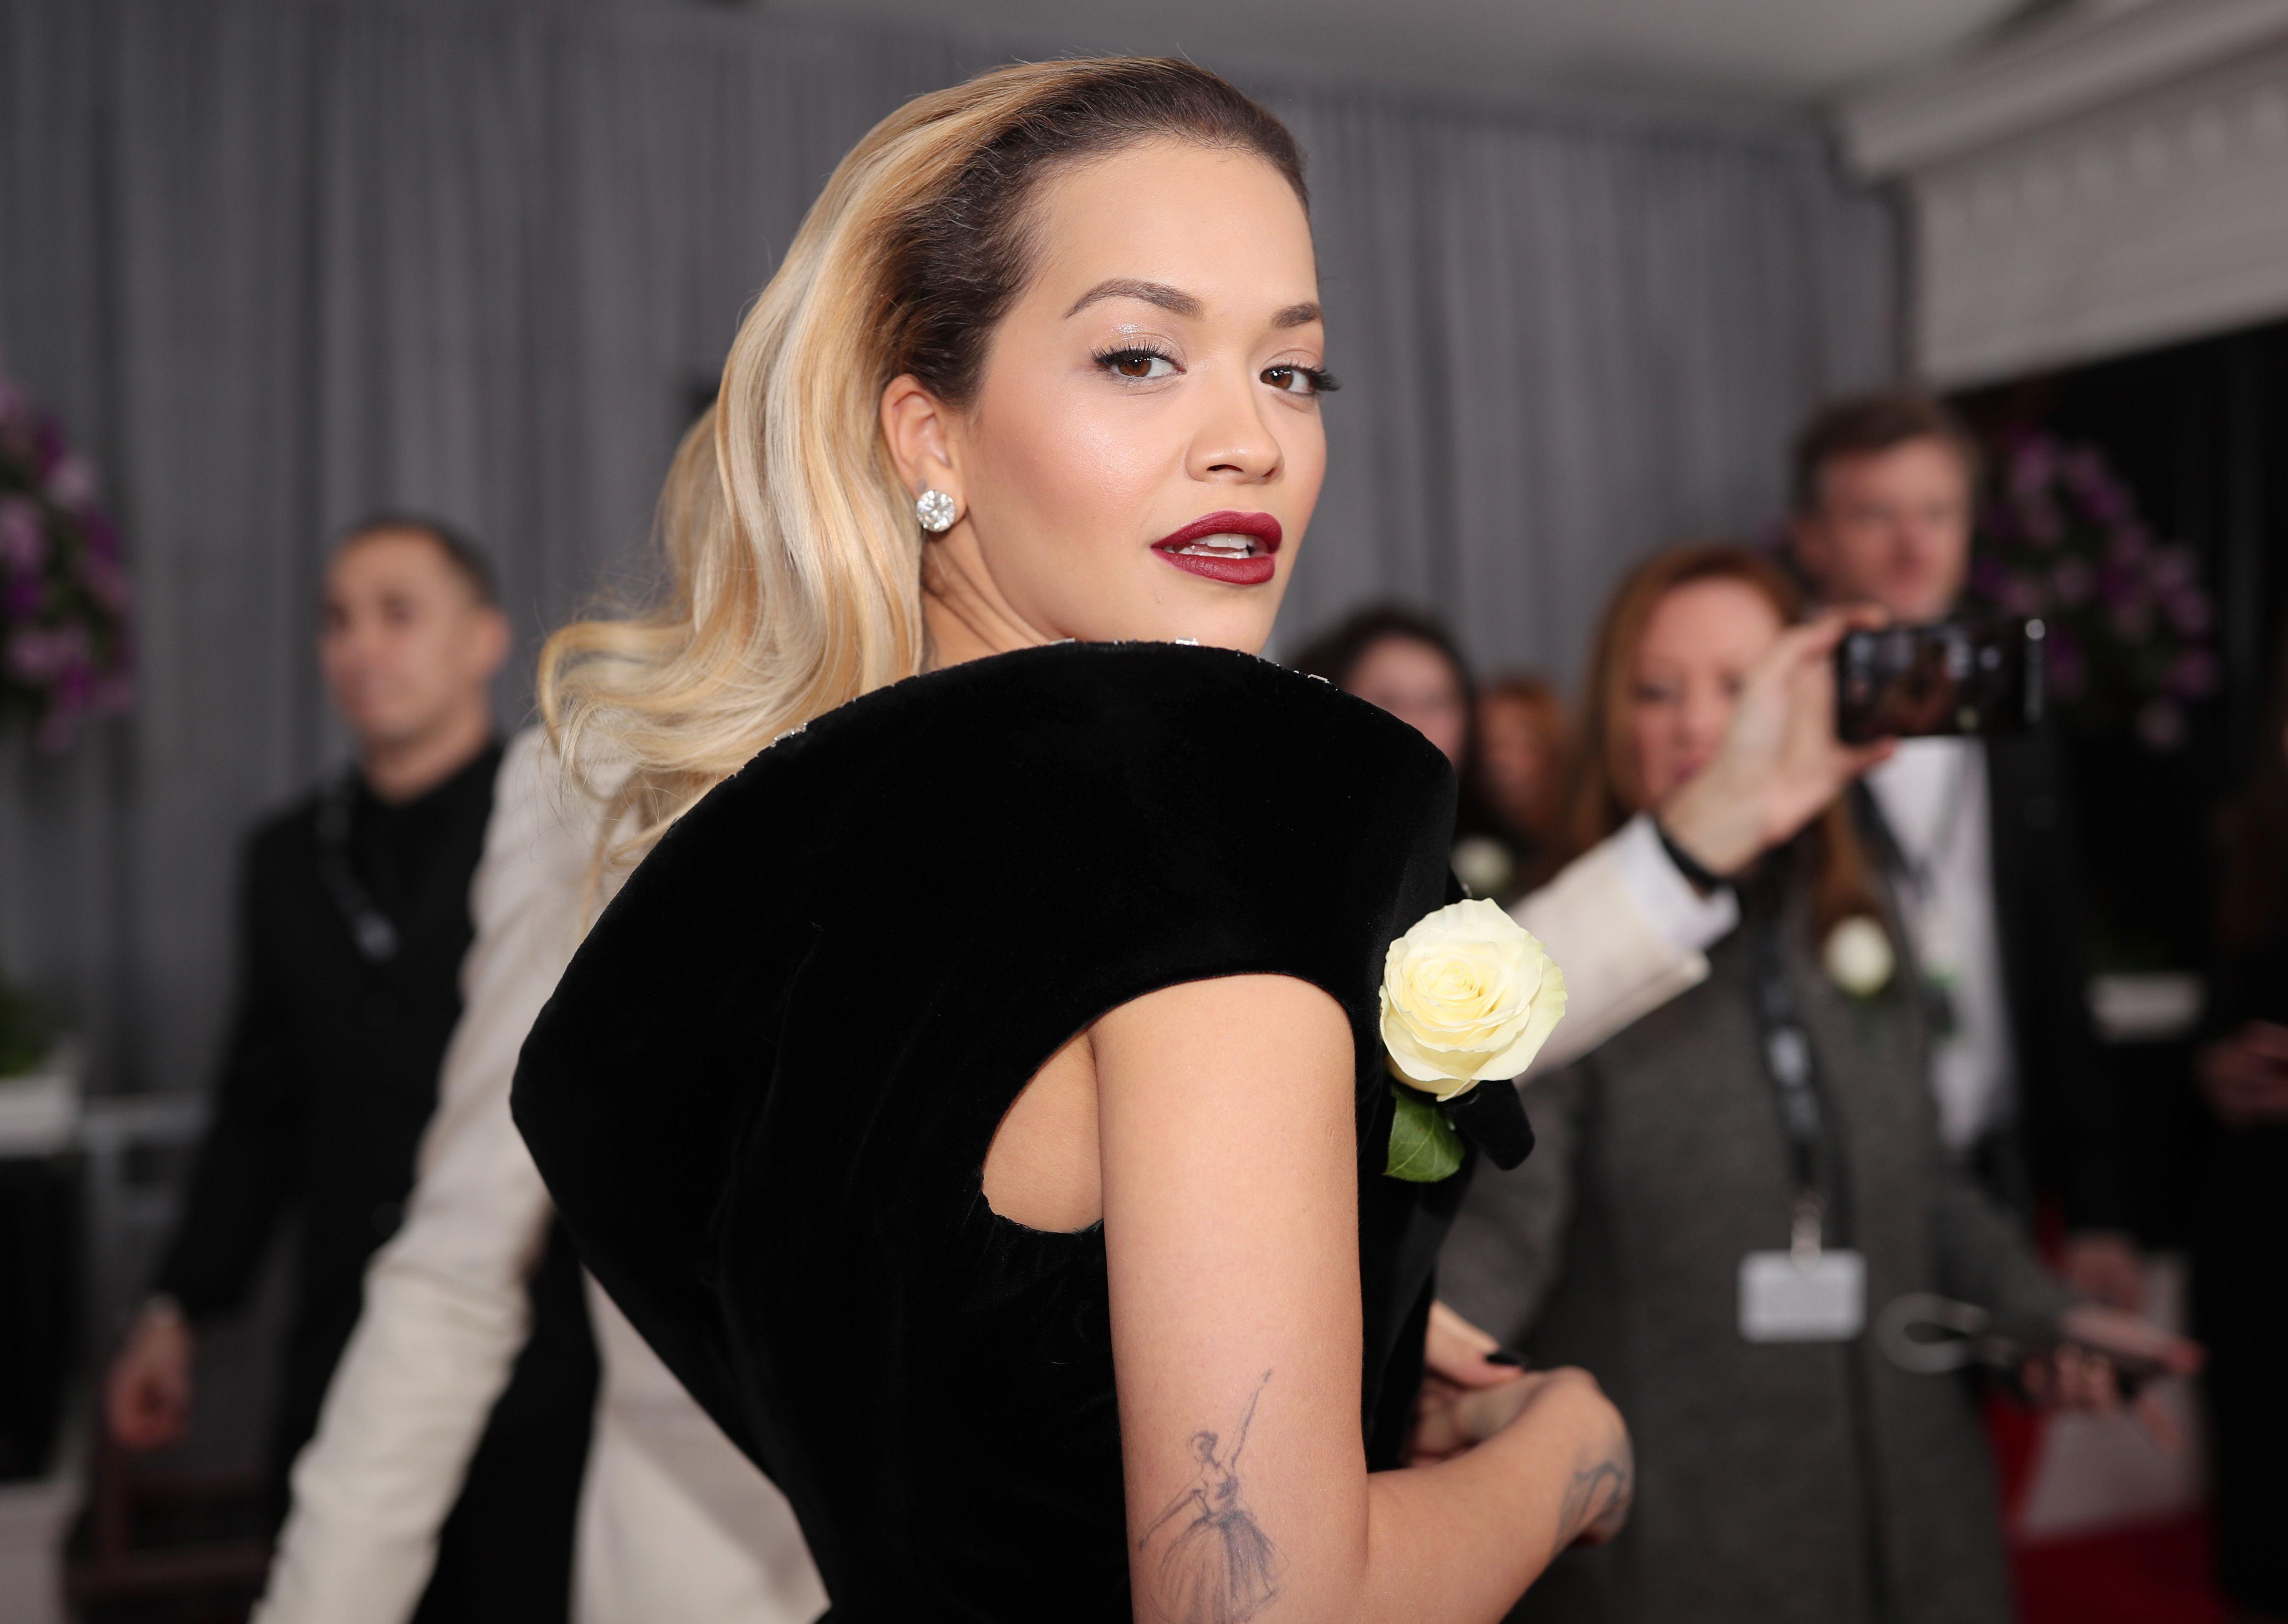 3dcc752bc0511 Watch Singer Rita Ora Talk About the Release of Album